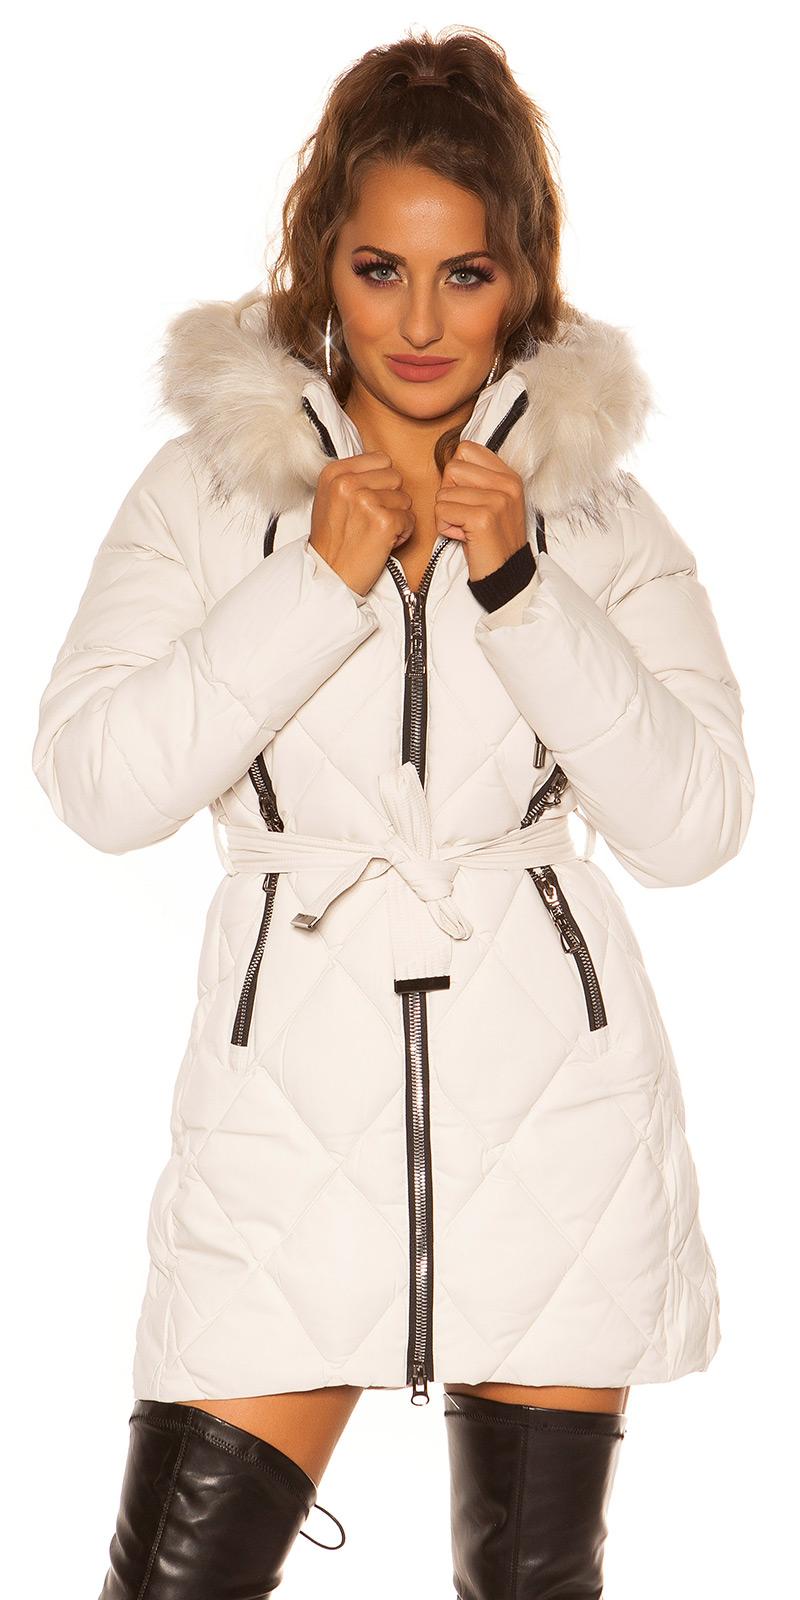 Jachete dama Sexy winter w. curea, ONLY blanita removable